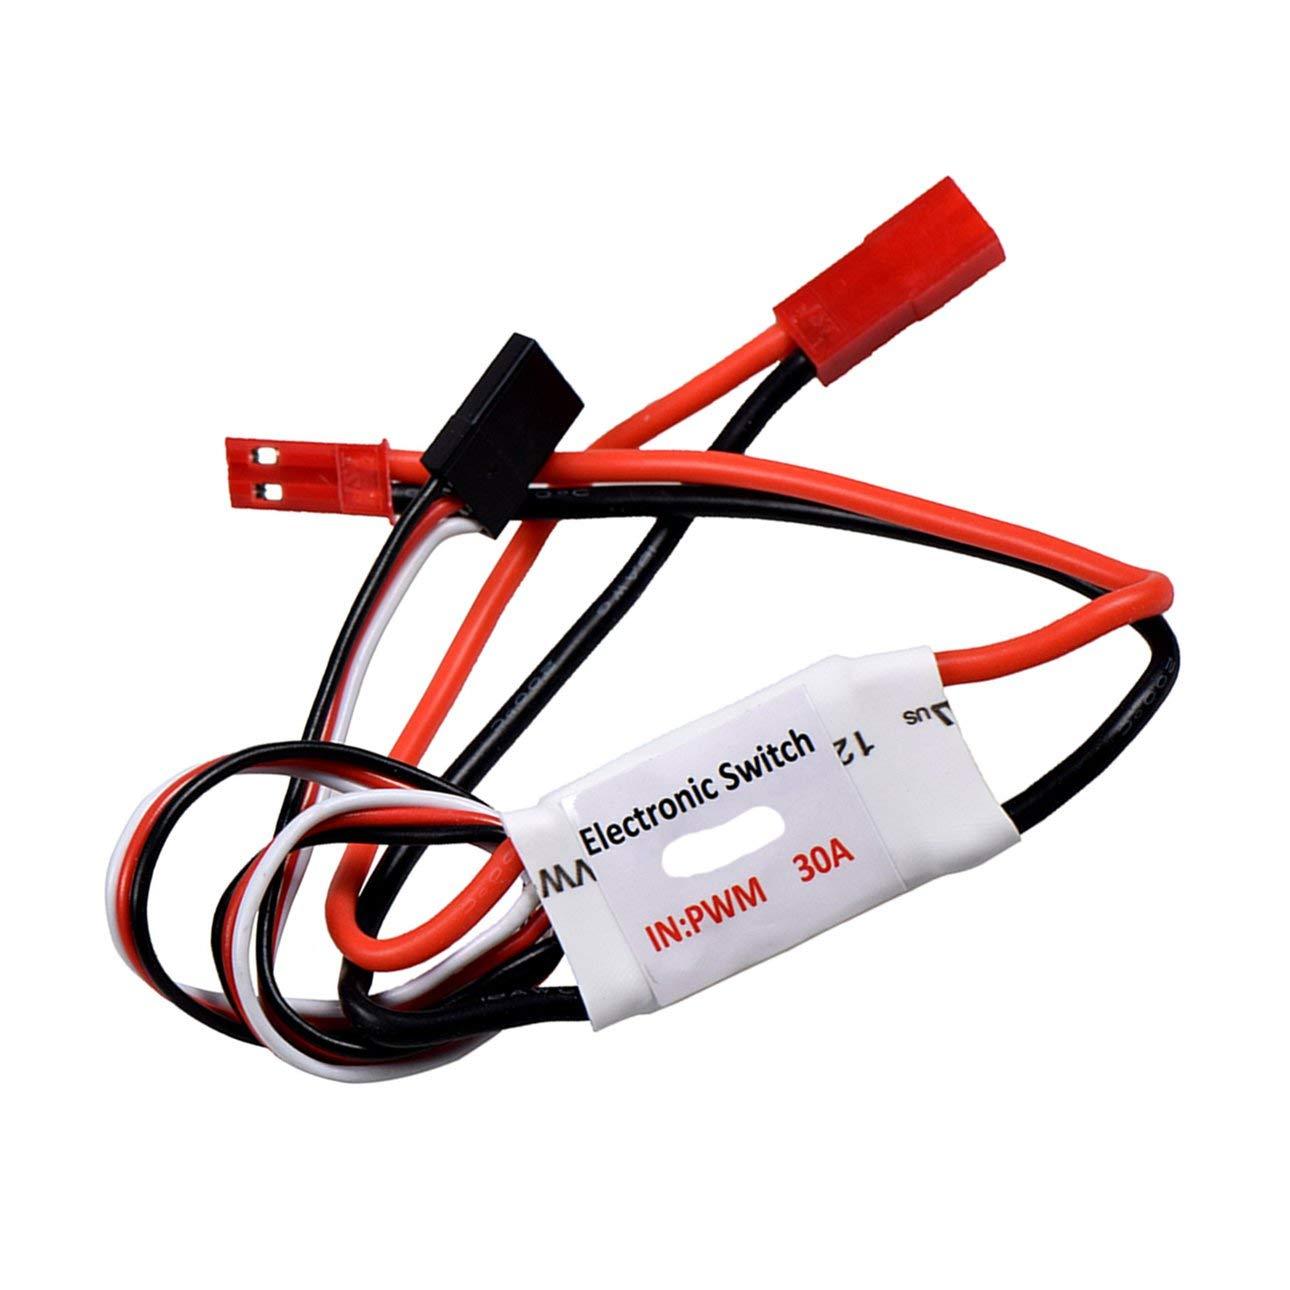 Ballylelly 30A Corriente 3.7V-27V Control Remoto Interruptor electr/ónico RC Bomba Interruptor Receptor Se/ñal PWM para Cambiar Luces